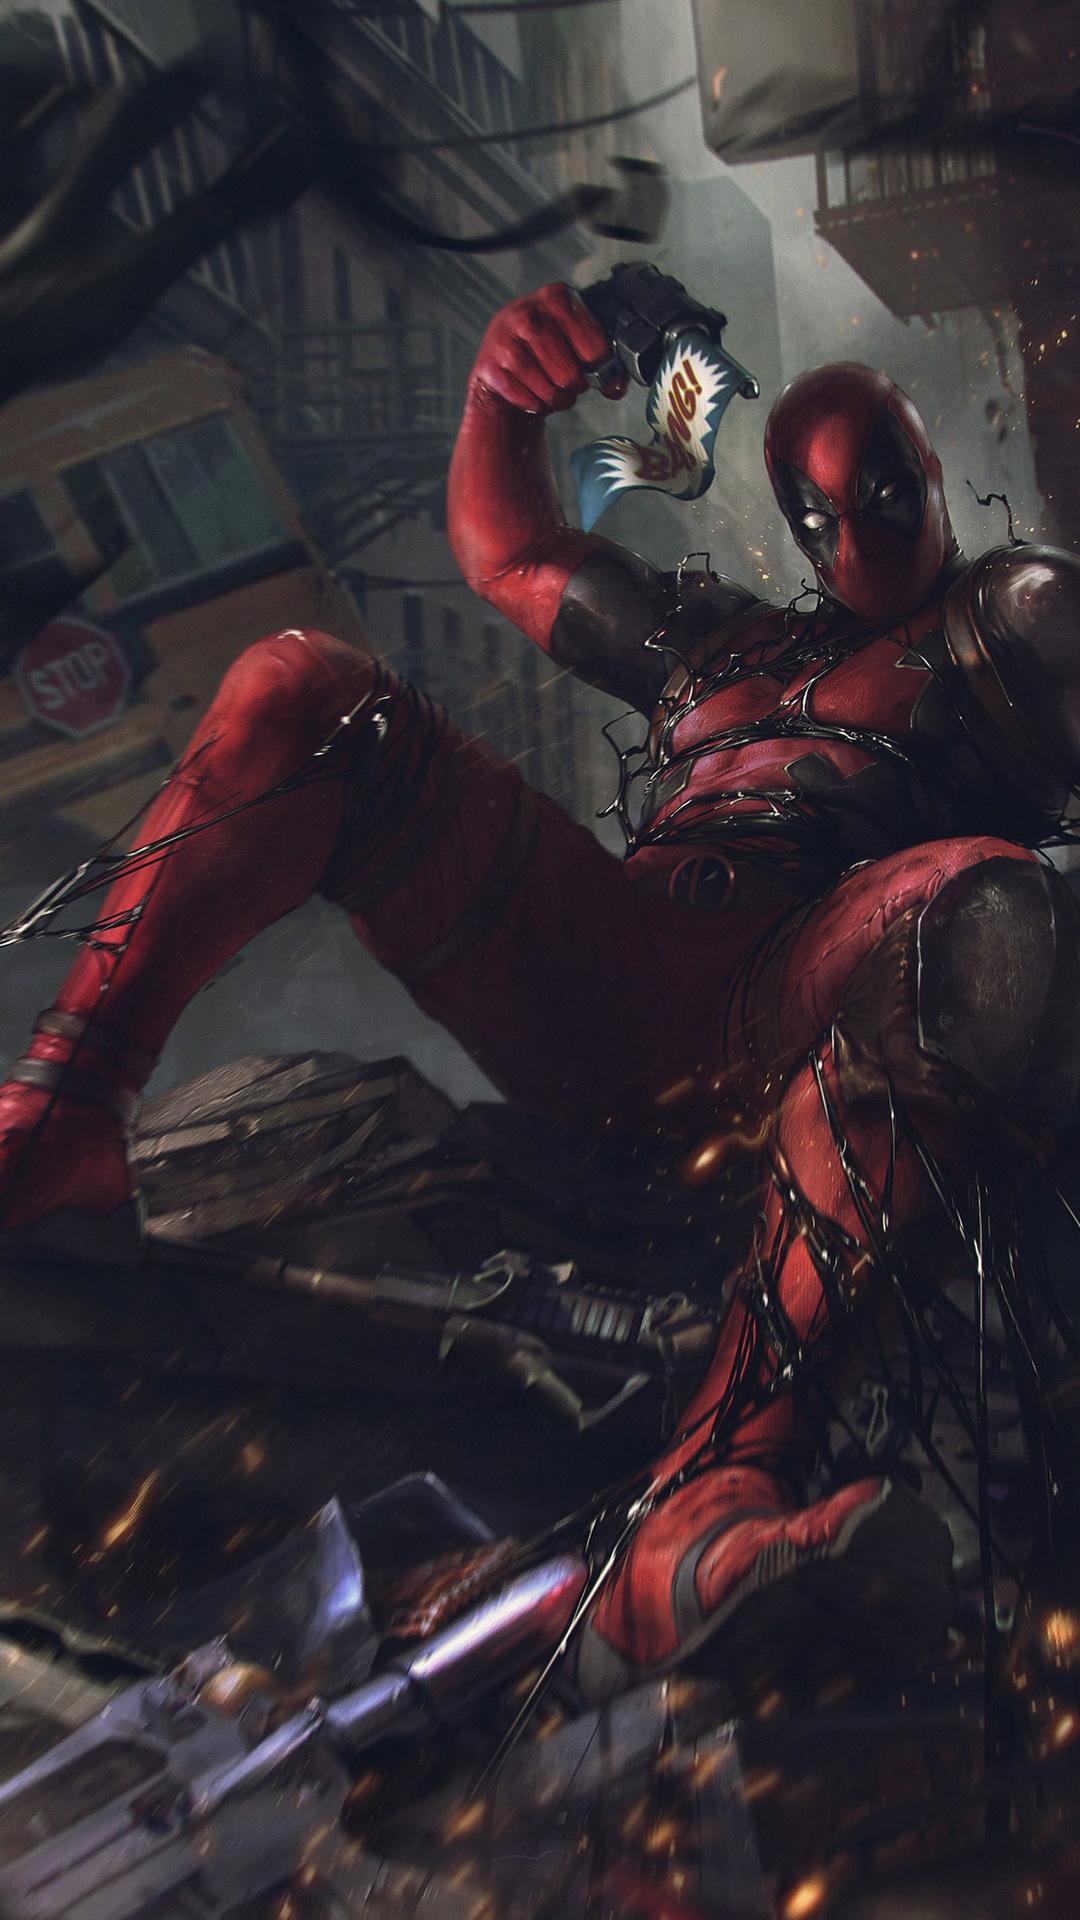 God Of War D 1080x1920 Deadpool Vs Venom Symbiote Iphone 7 6s 6 Plus